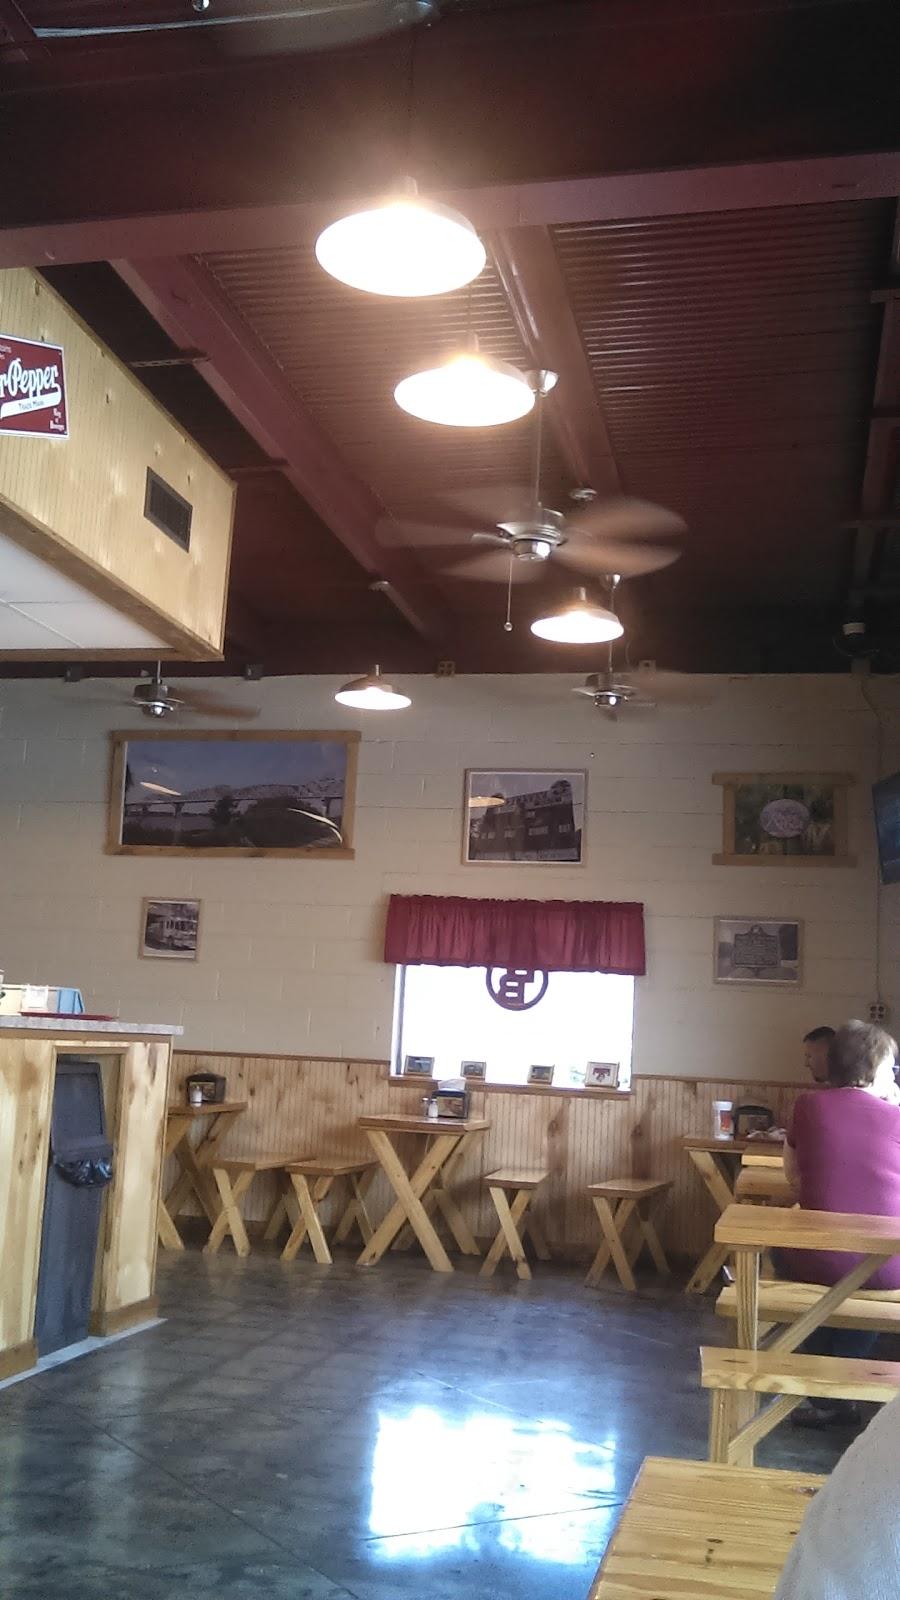 Dunkin - bakery  | Photo 15 of 15 | Address: 61 Main St, Salisbury, MA 01952, USA | Phone: (978) 462-1189